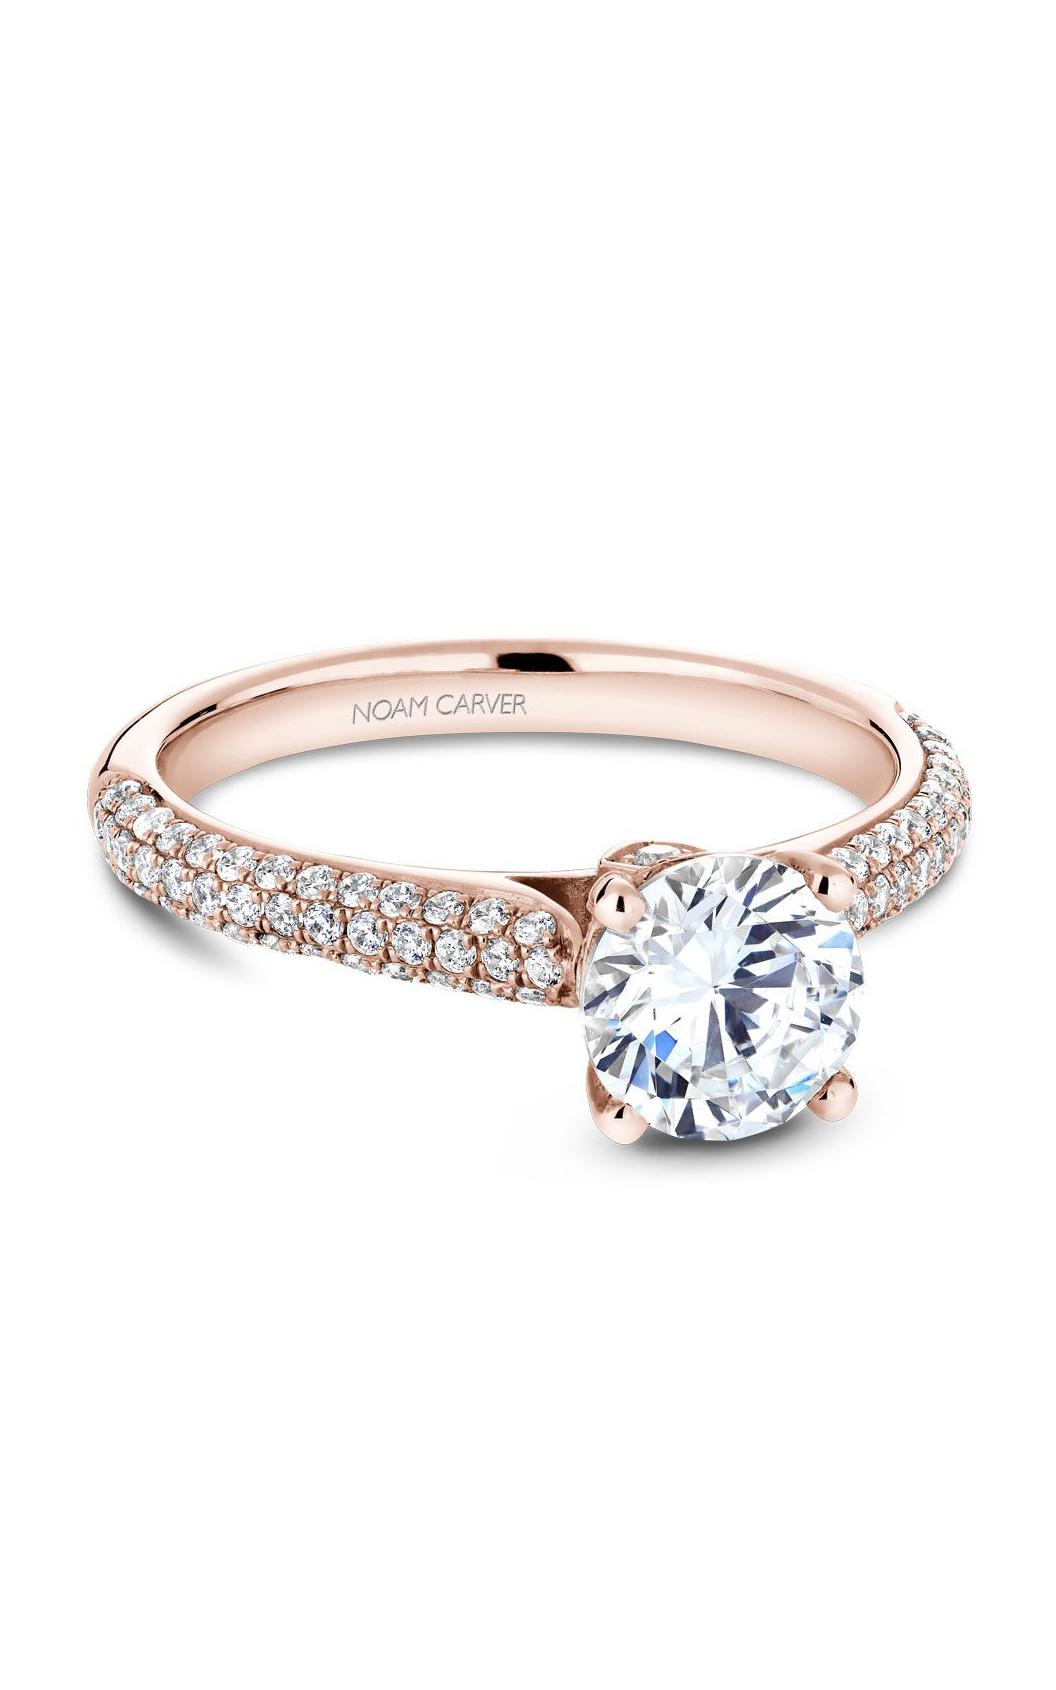 Noam Carver Vintage Engagement Ring B146-02RM product image